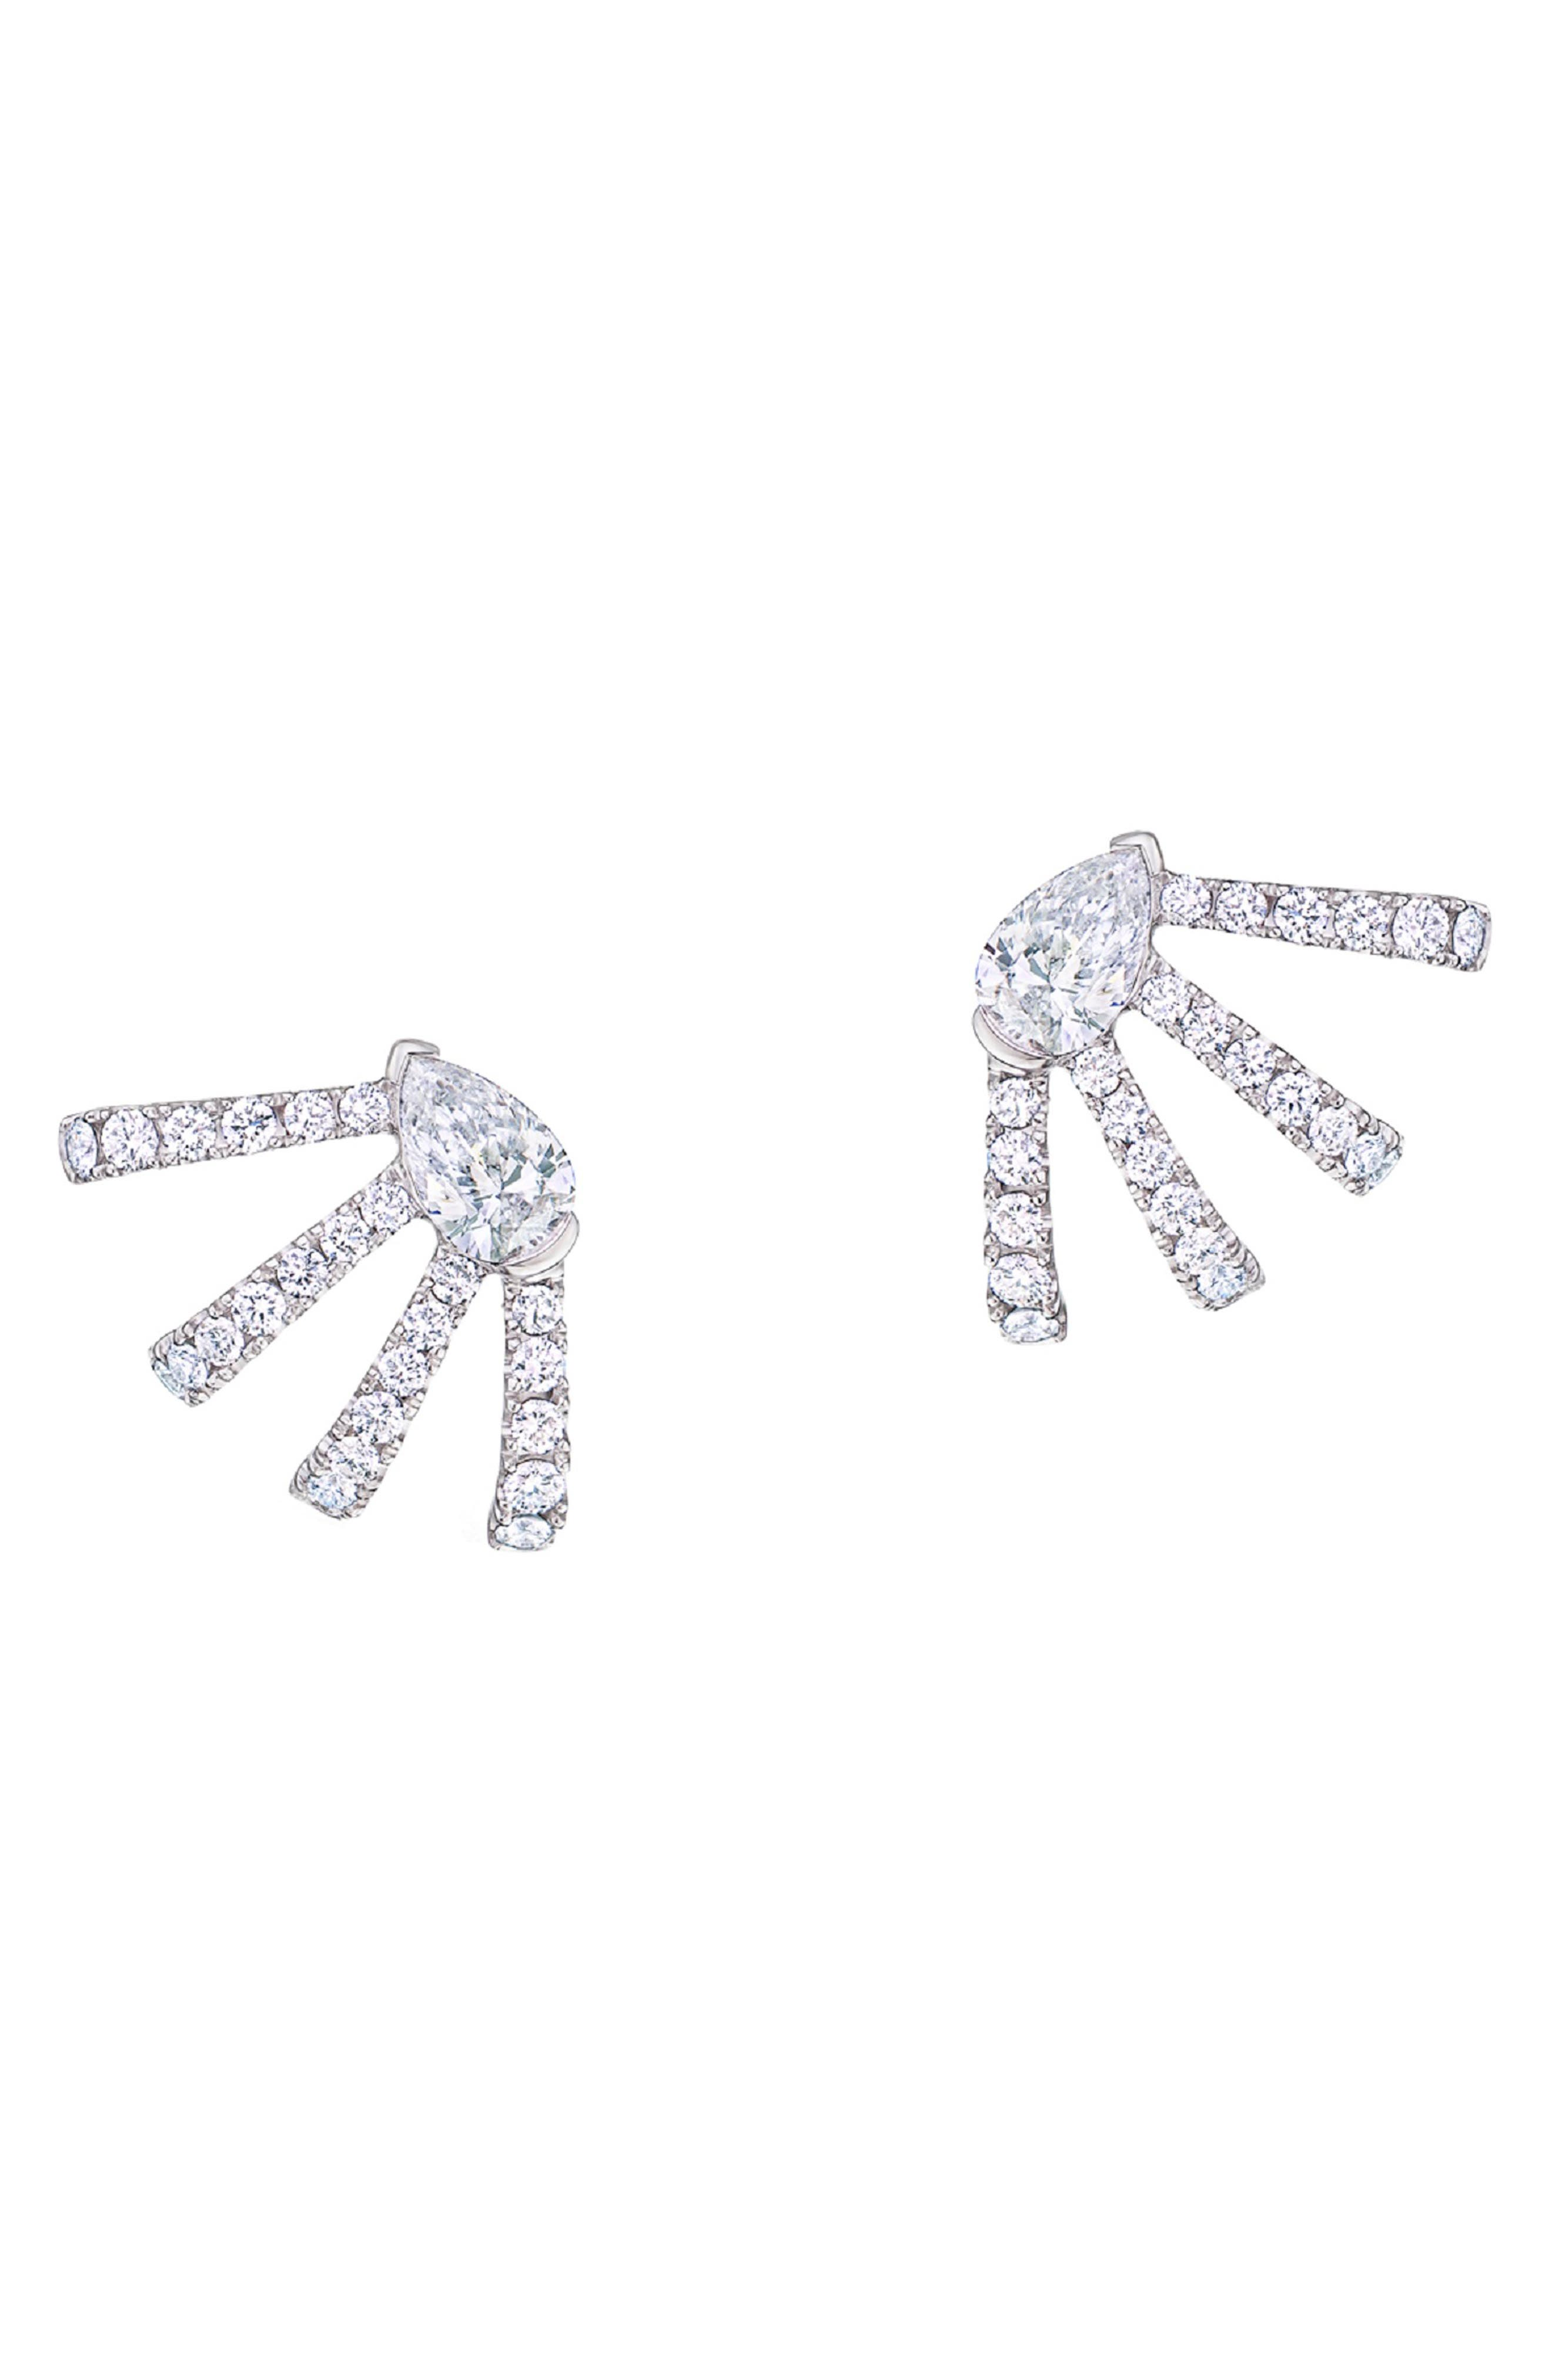 KWIAT Wraparound Diamond Stud Earrings in Yellow